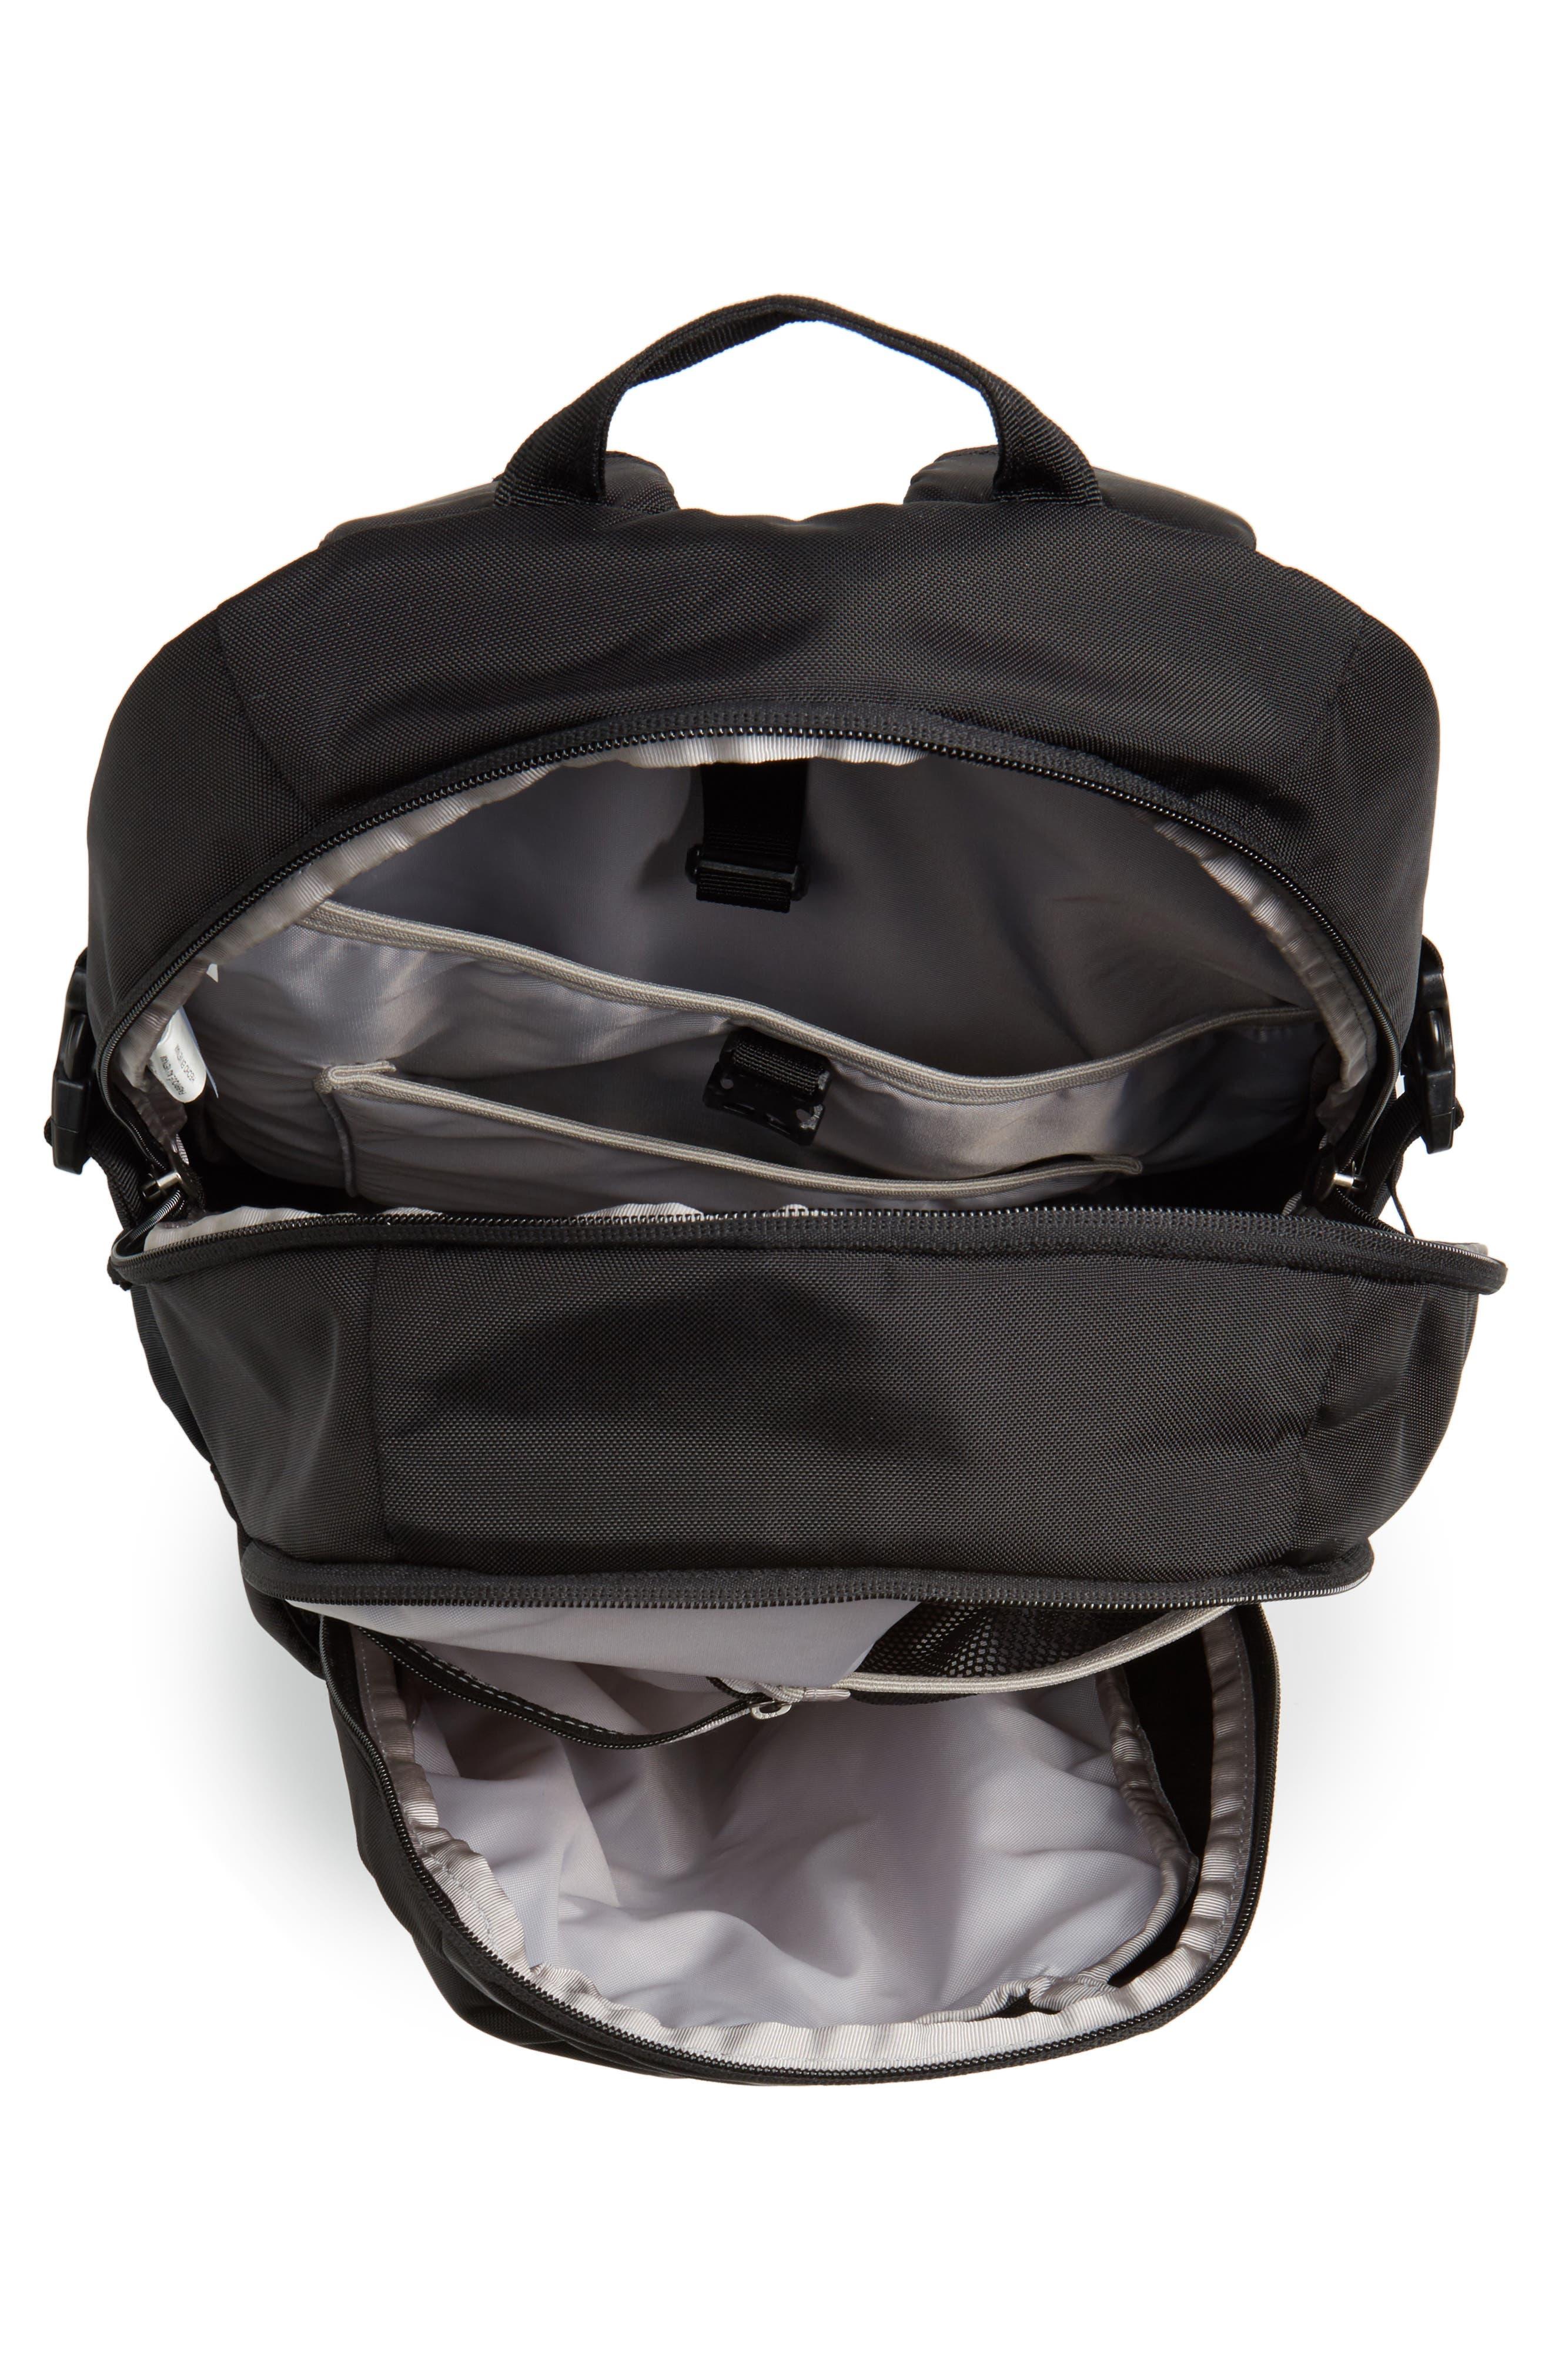 28L Refugio Backpack,                             Alternate thumbnail 4, color,                             BLACK